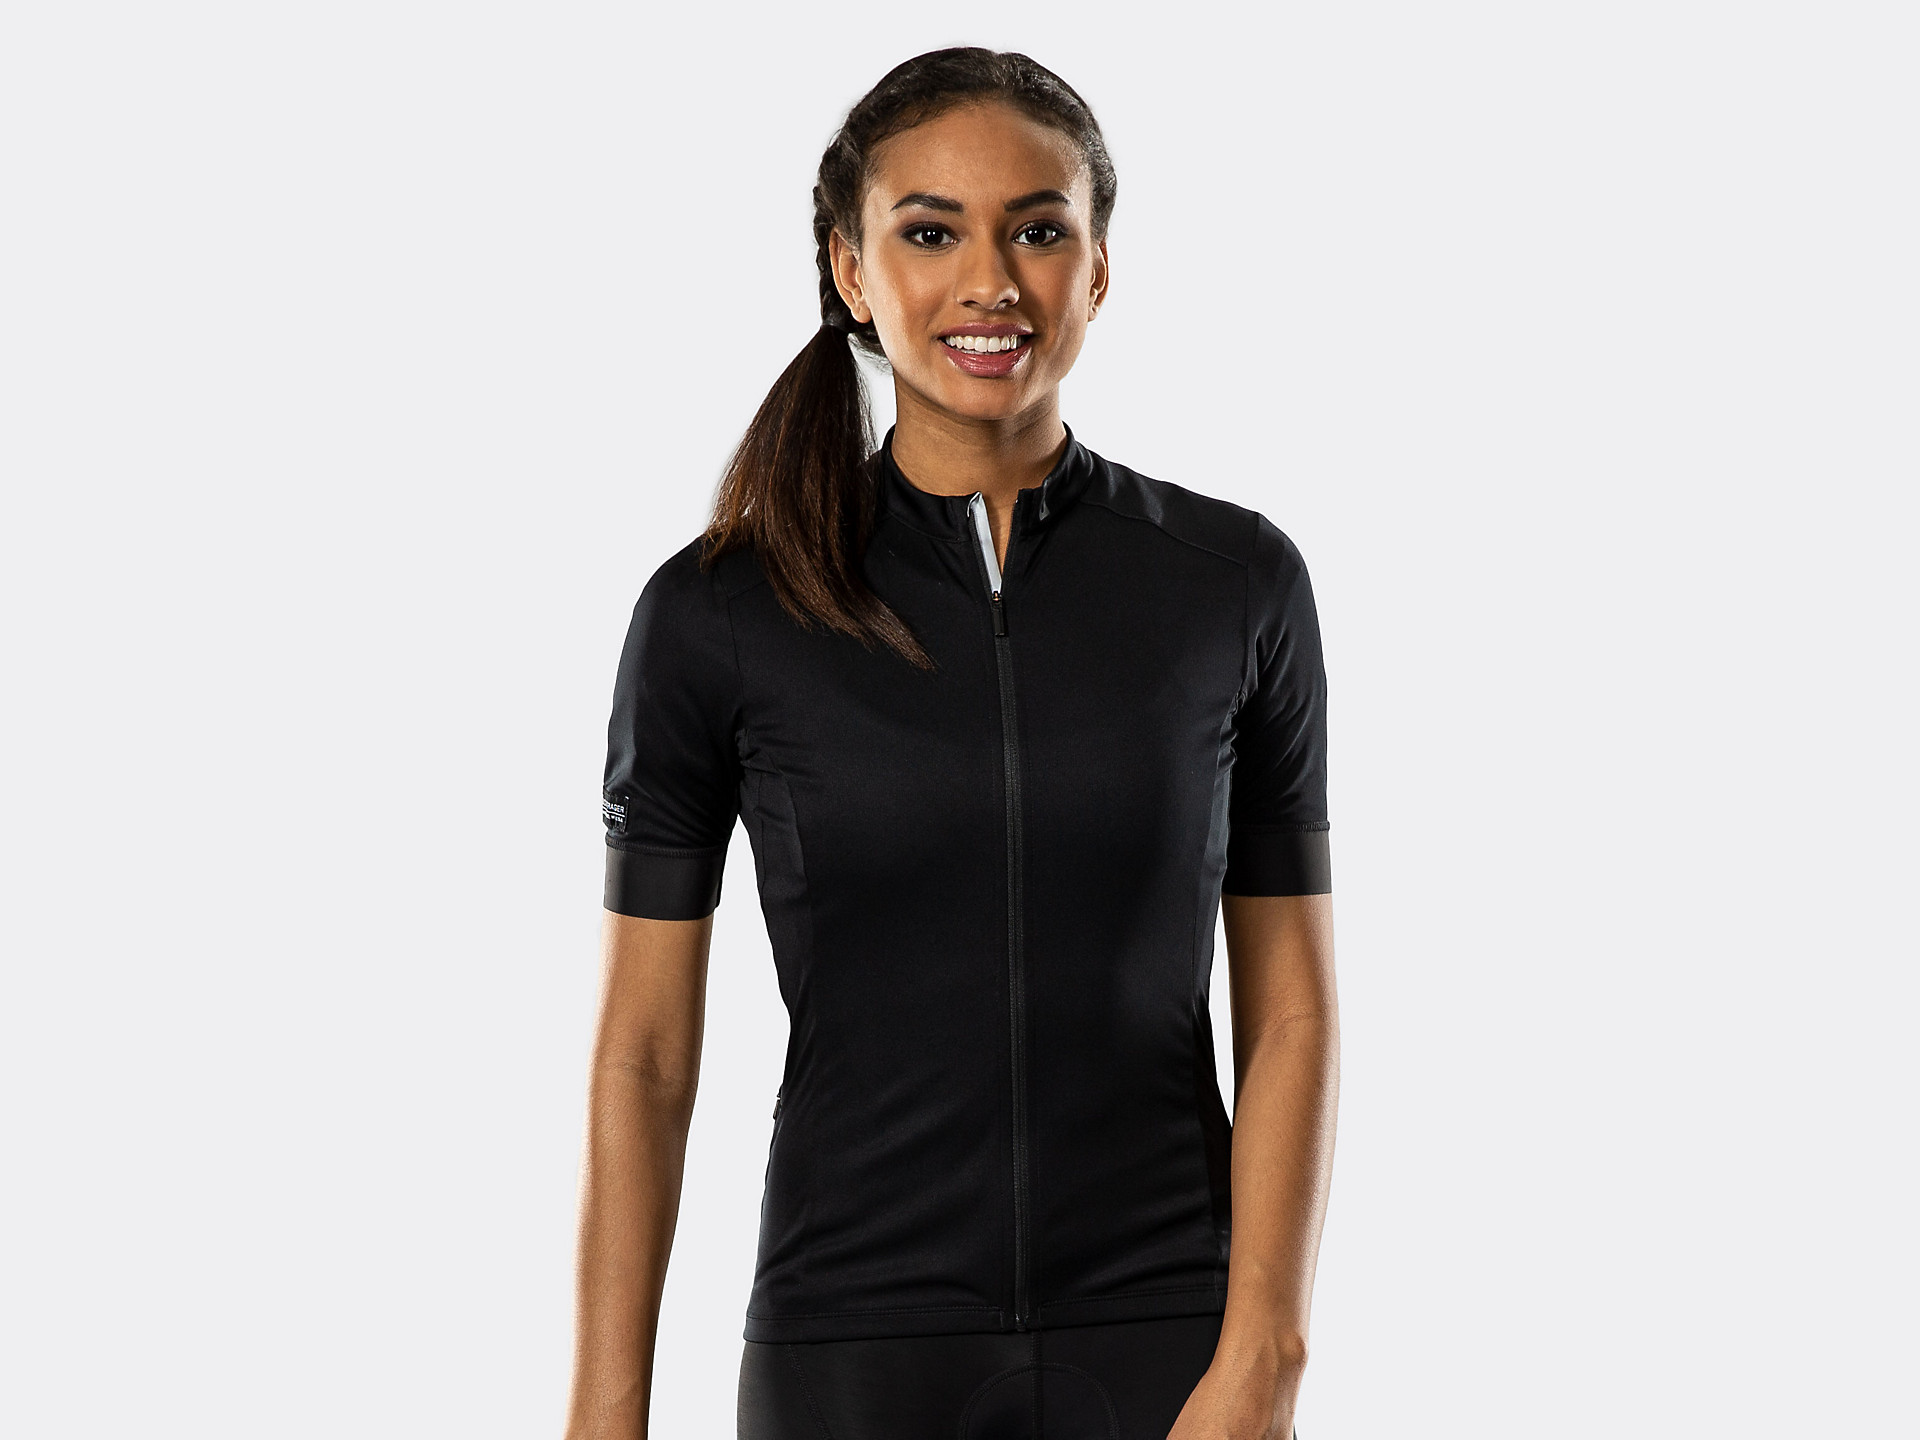 Bontrager Meraj Women s Cycling Jersey  cb98b205d